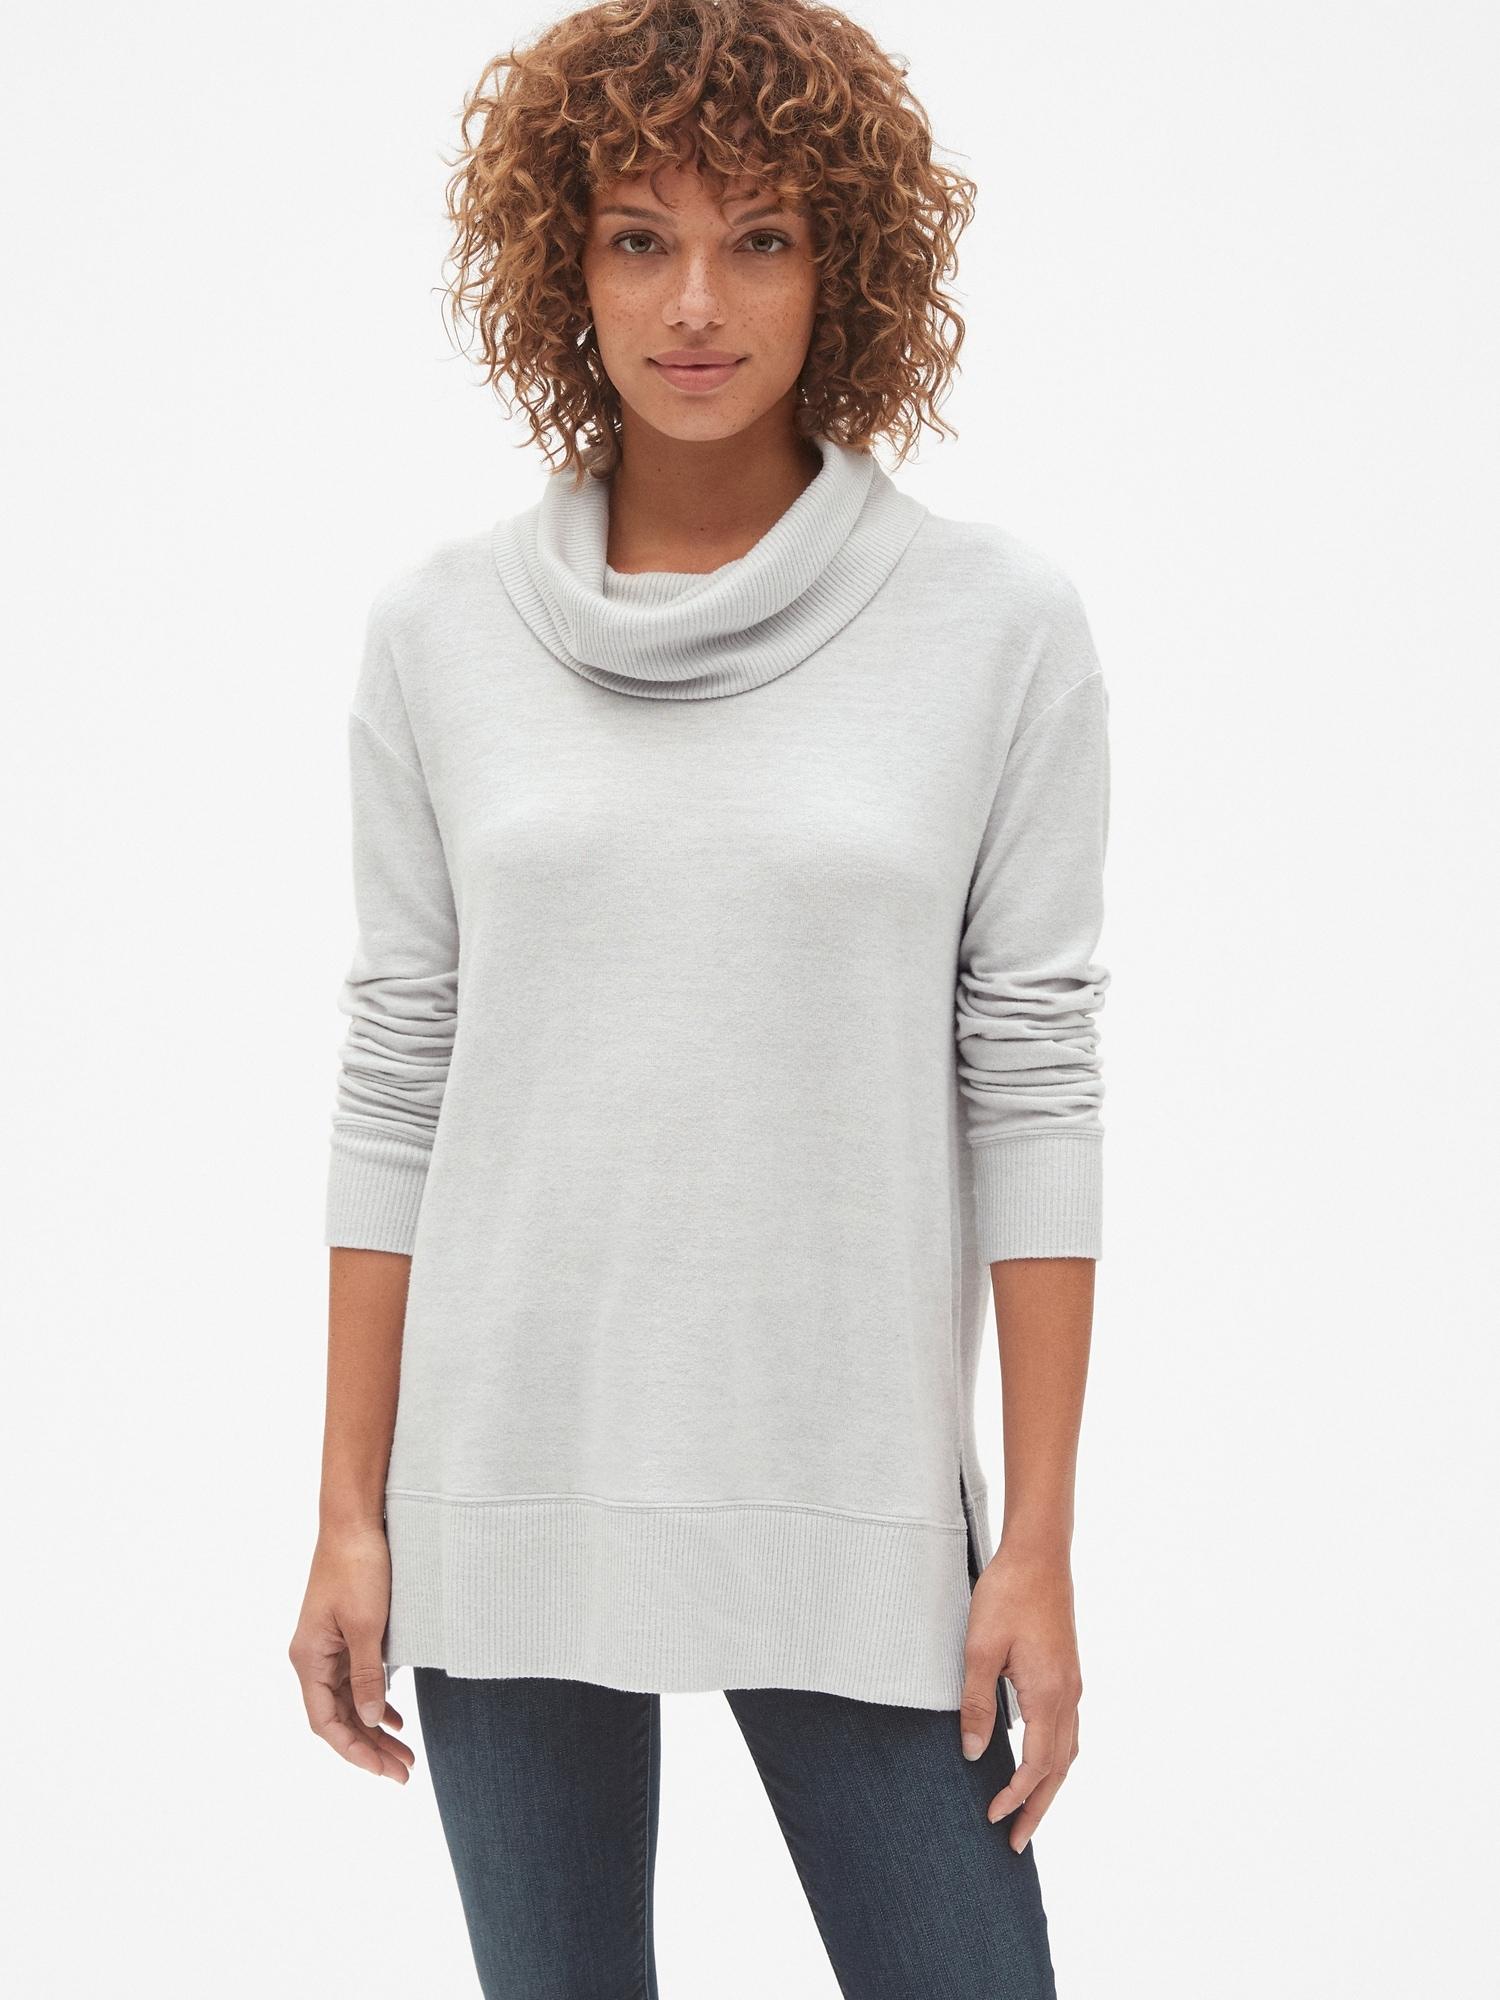 a5b503a1 Softspun Cowl-Neck Pullover Sweater | Gap